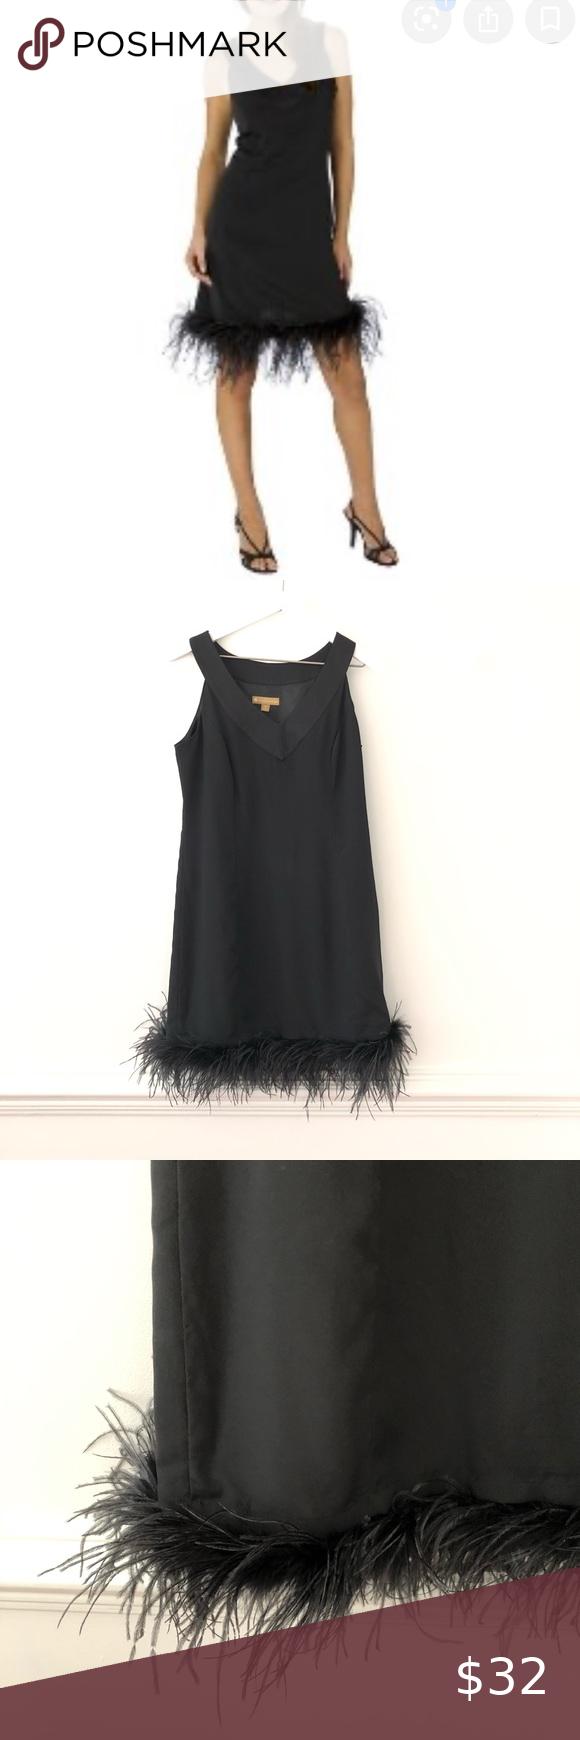 Target Limited Edition Vicky Feather Trim Dress Dresses Target Dresses Little Black Dress [ 1740 x 580 Pixel ]